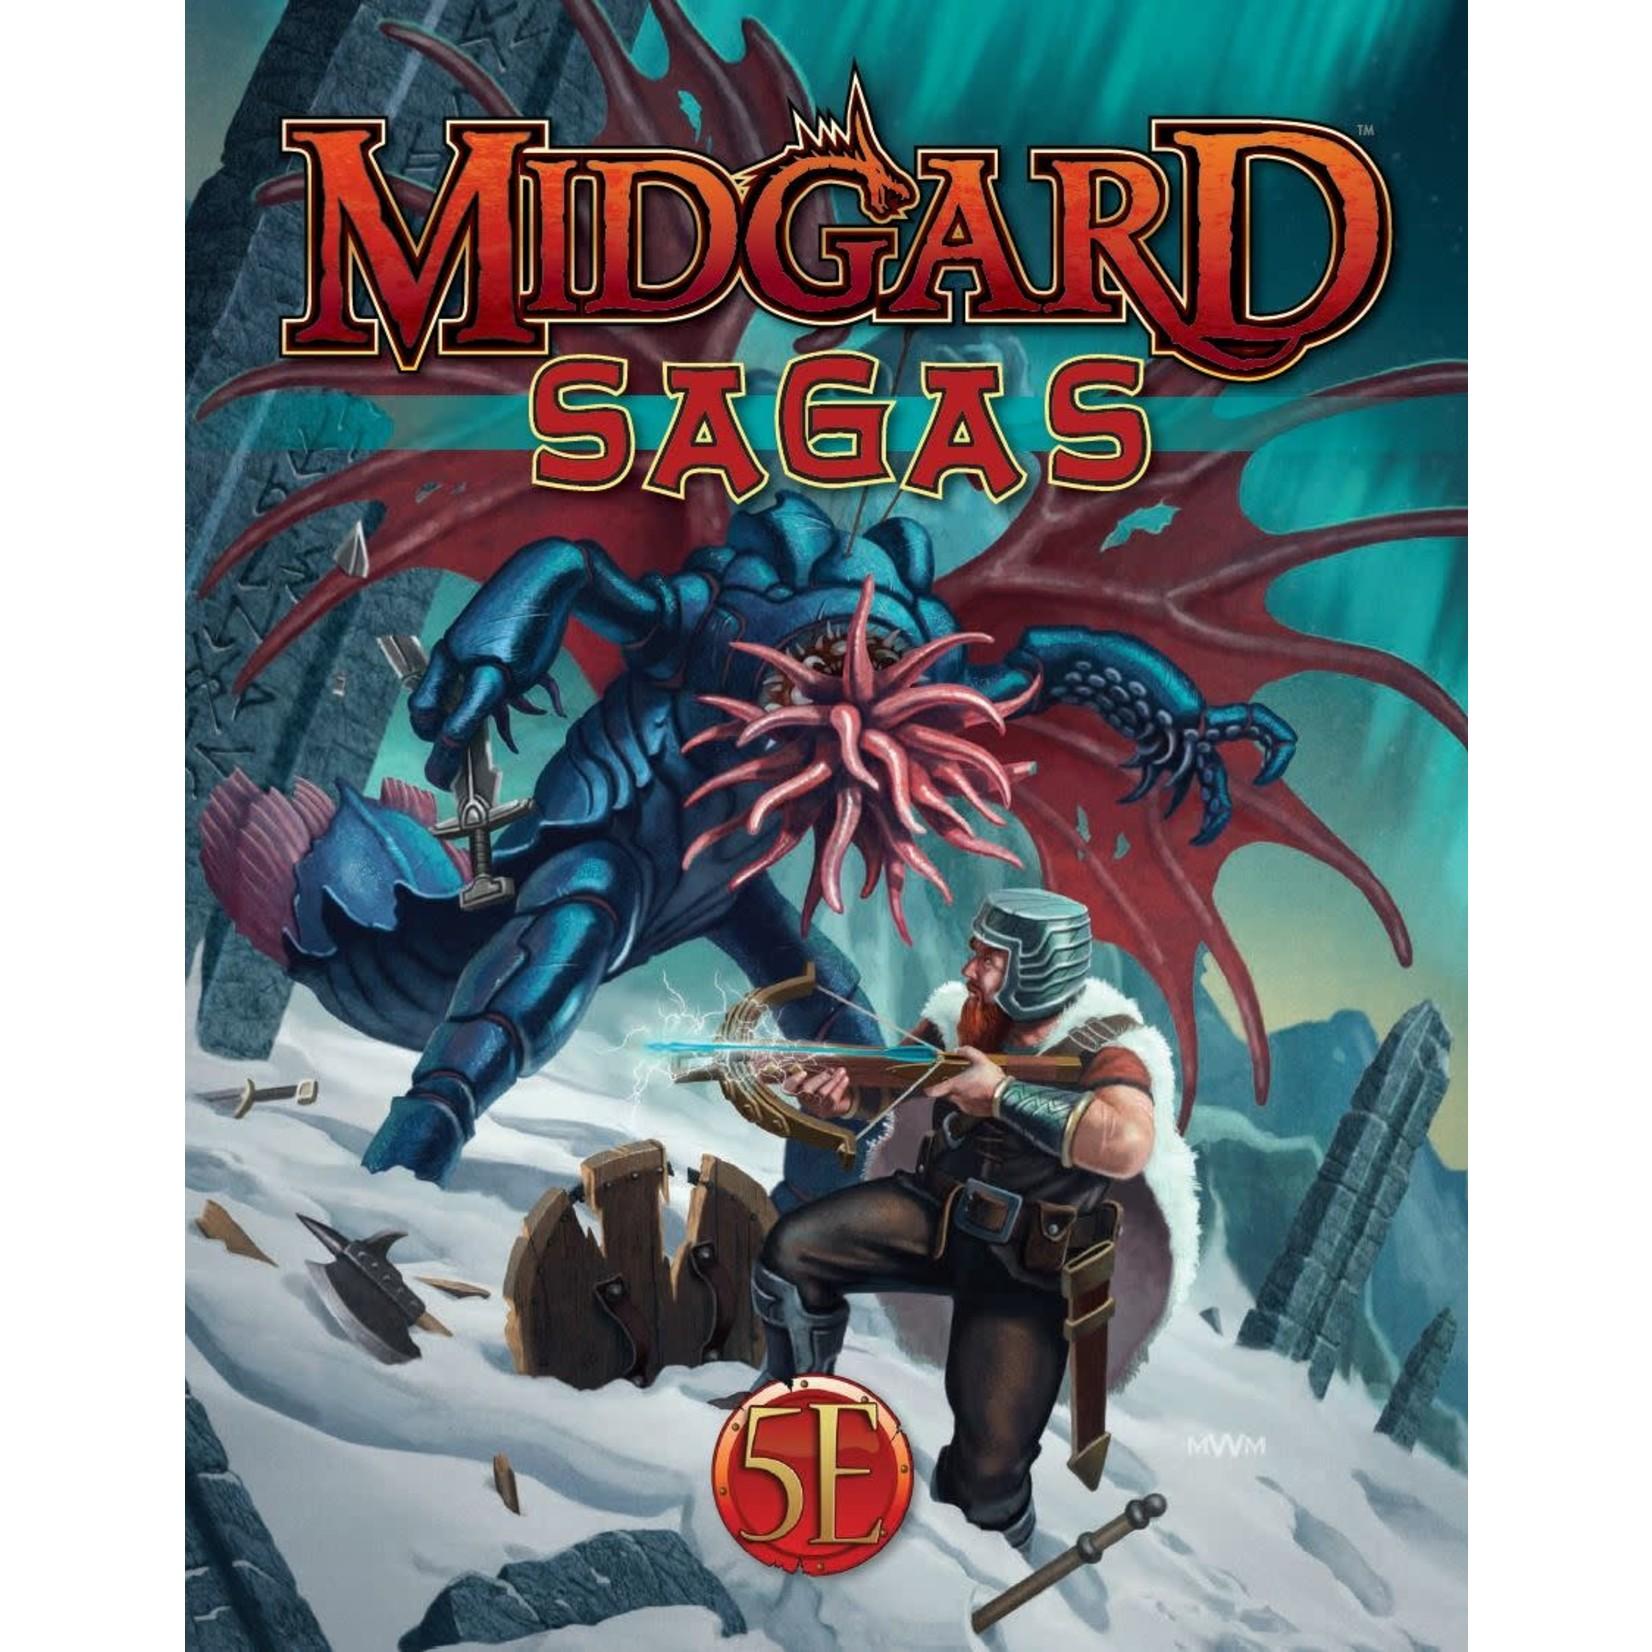 D&D 5e Midgard Sagas